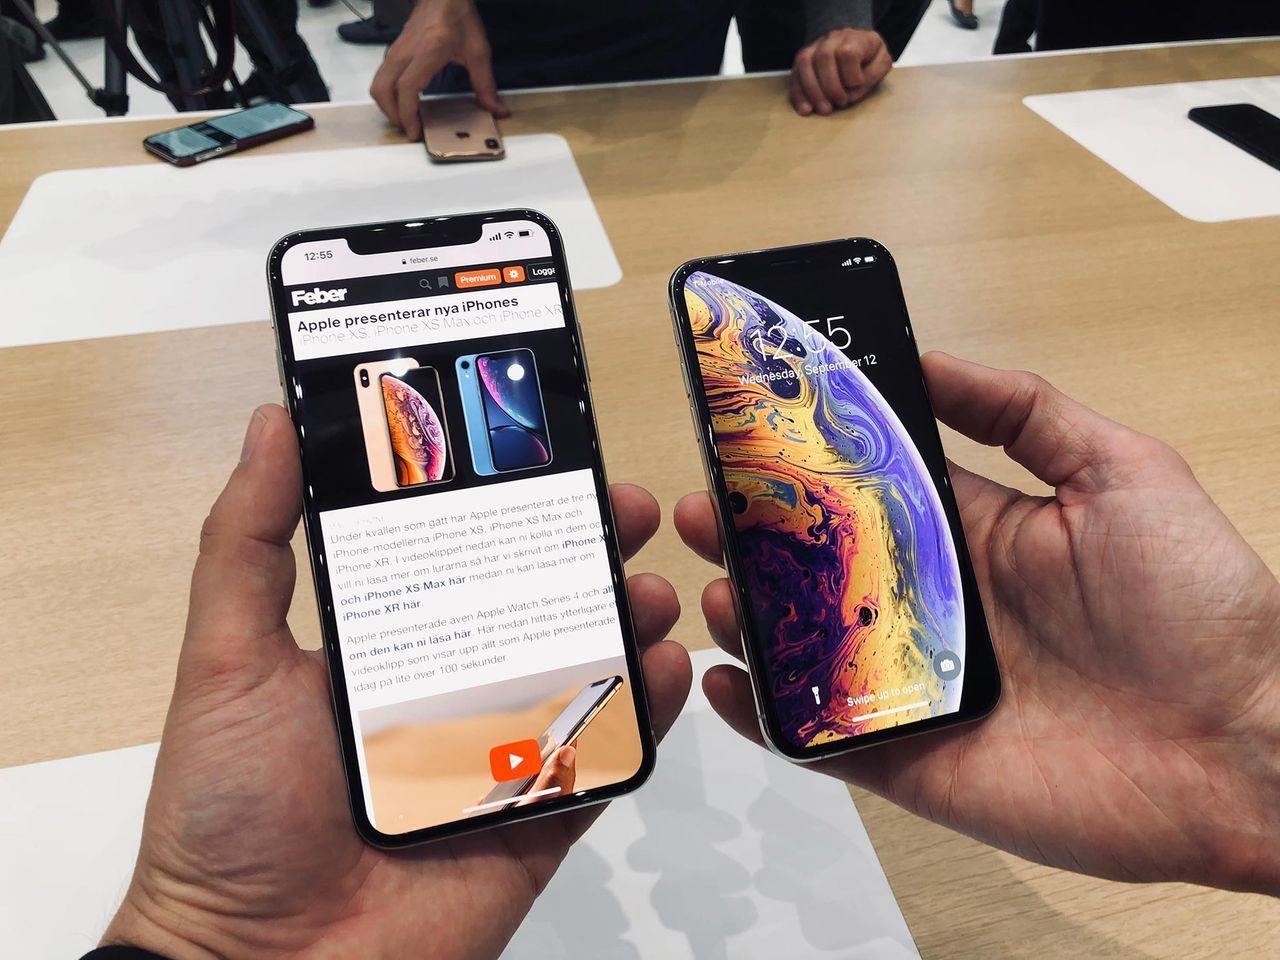 ... iPhone XS Max och iPhone XR. Apple presenterar nya iPhones 3789c0acb2aeb